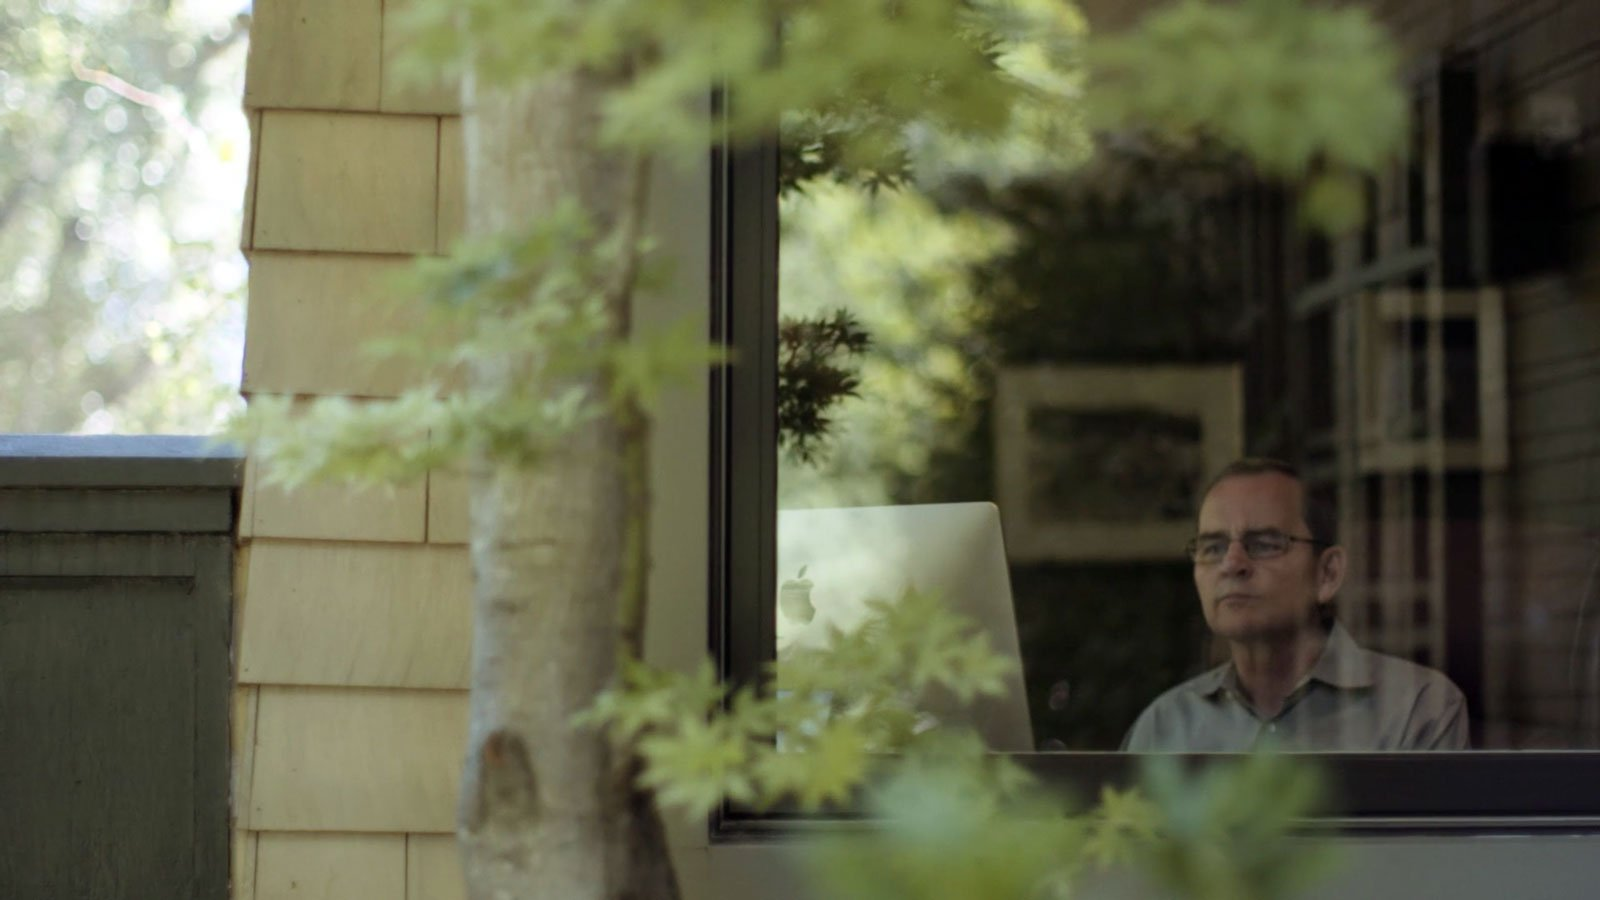 john brandon seen through a window as he's on his macbook